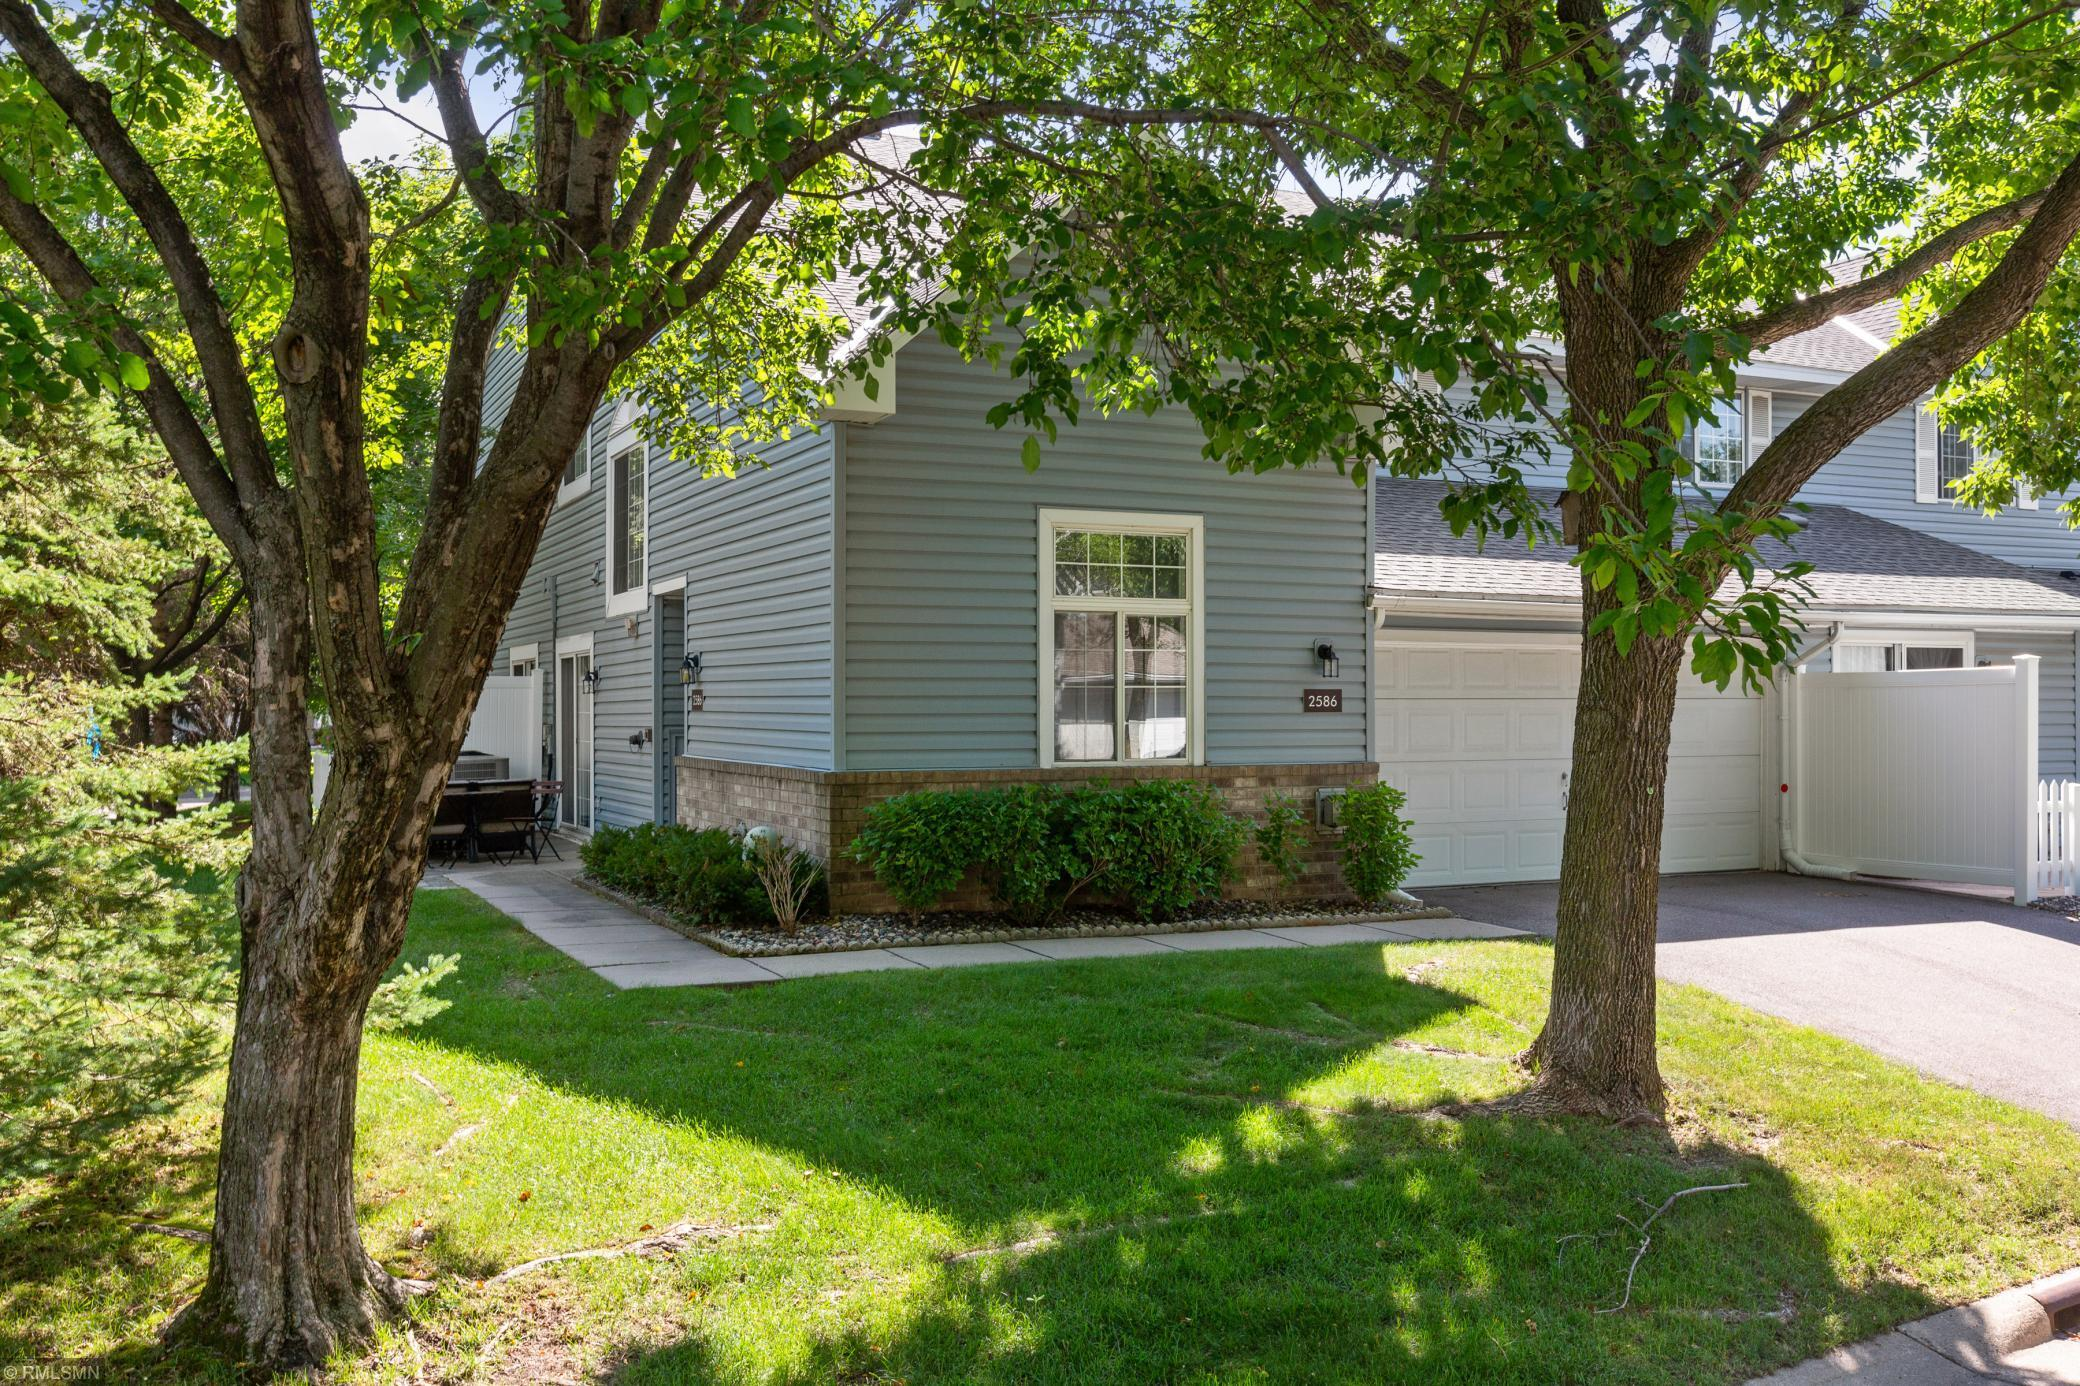 2586 Lockwood #80 Property Photo - Mendota Heights, MN real estate listing